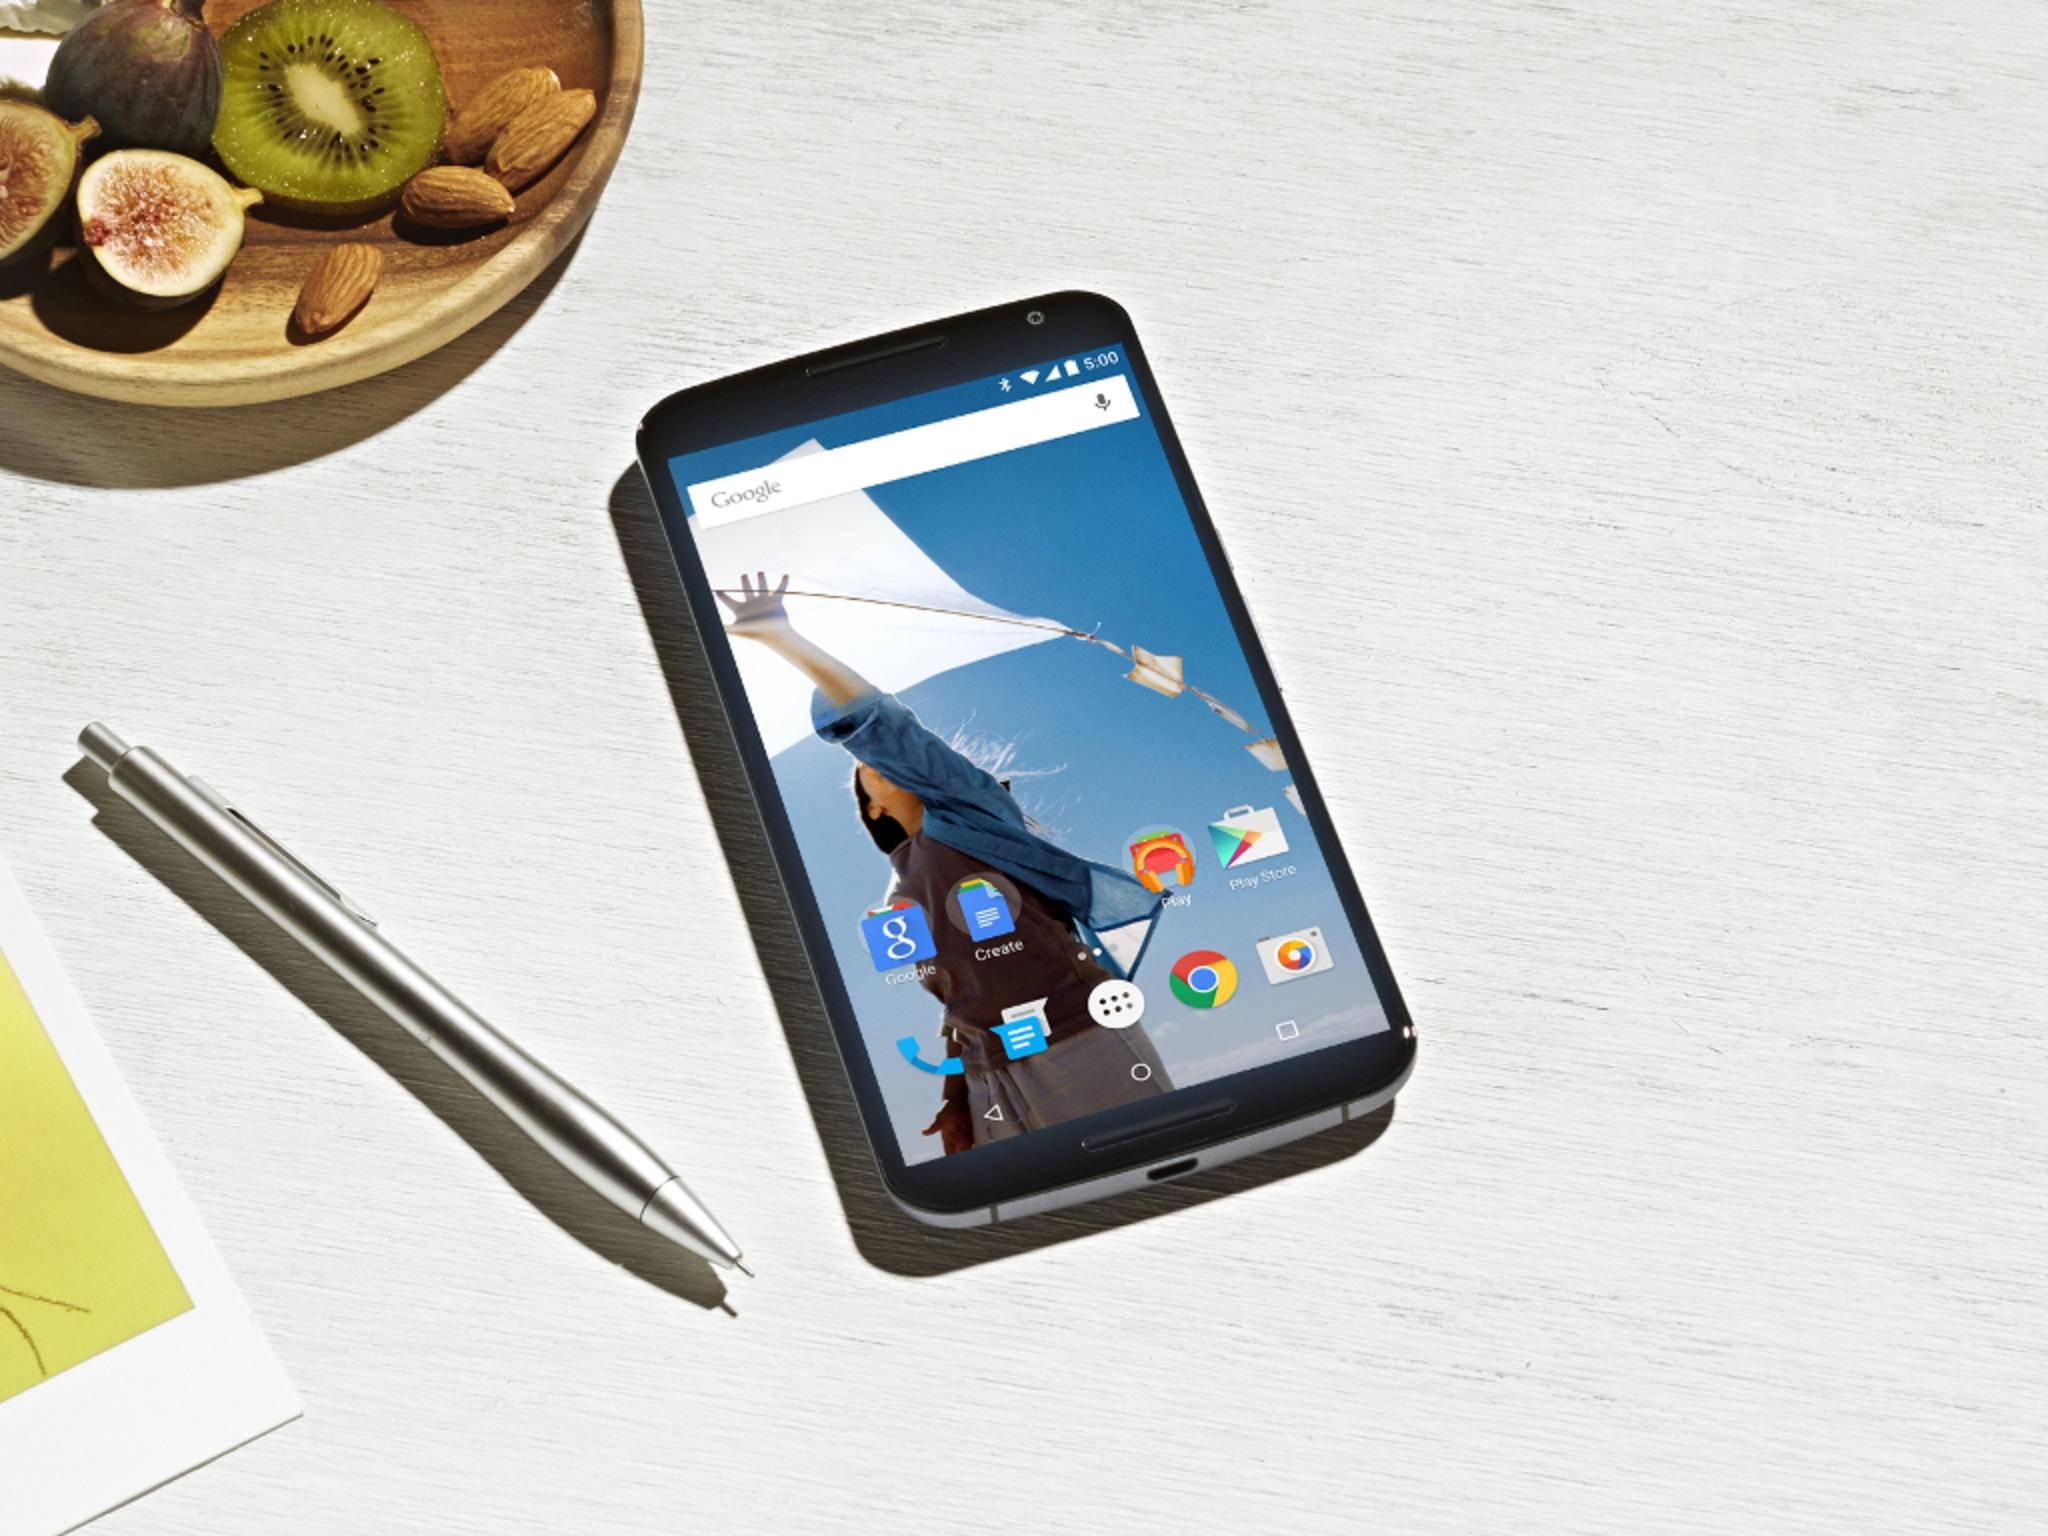 Das Google Nexus 6 kommt erst am 18. November nach Europa.